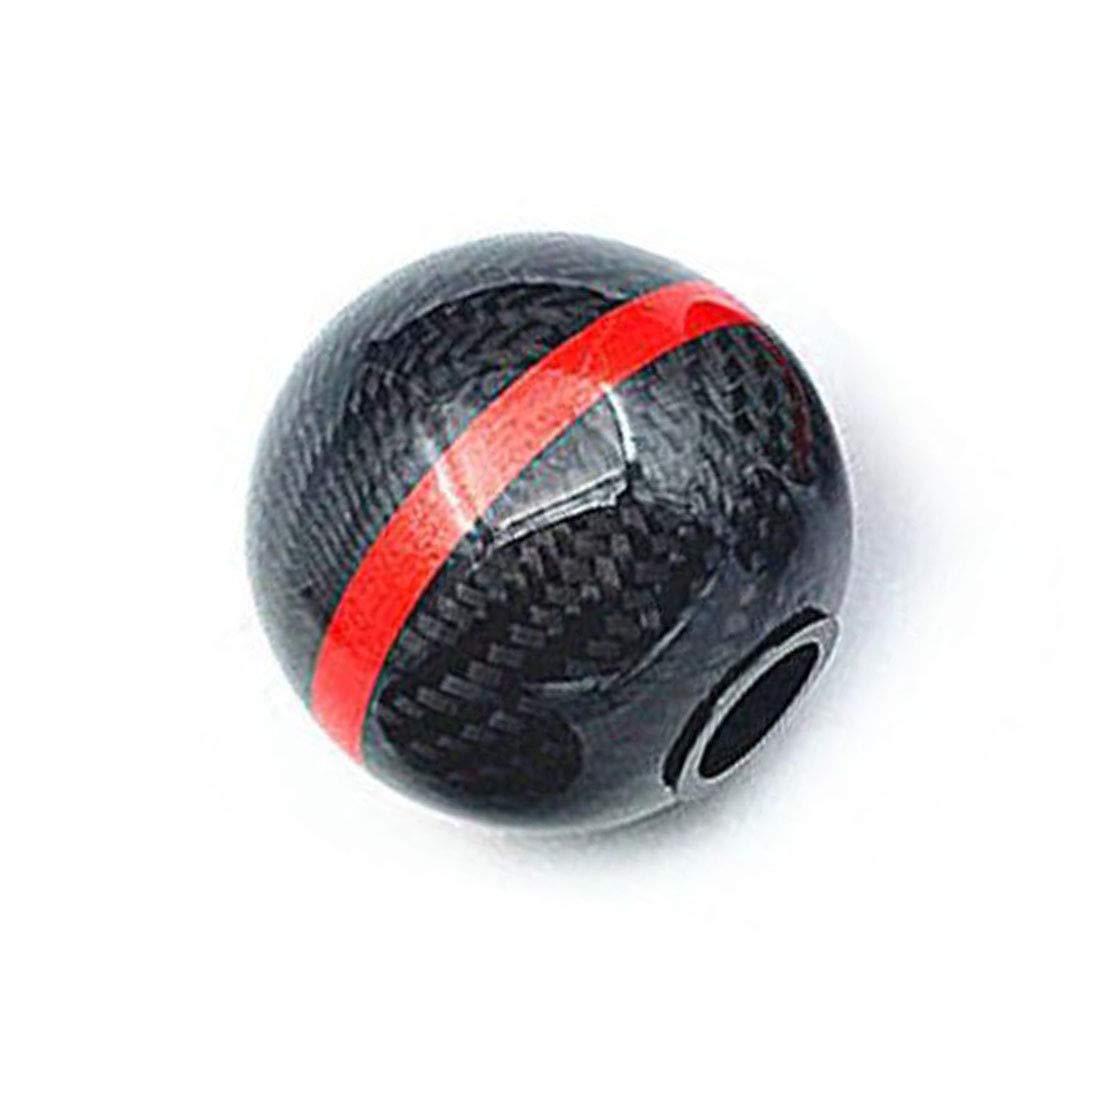 Richdoo Set Carbon Fibre 6 Speed Gear Shift Knob Shifter RED Stripe Mugen Style